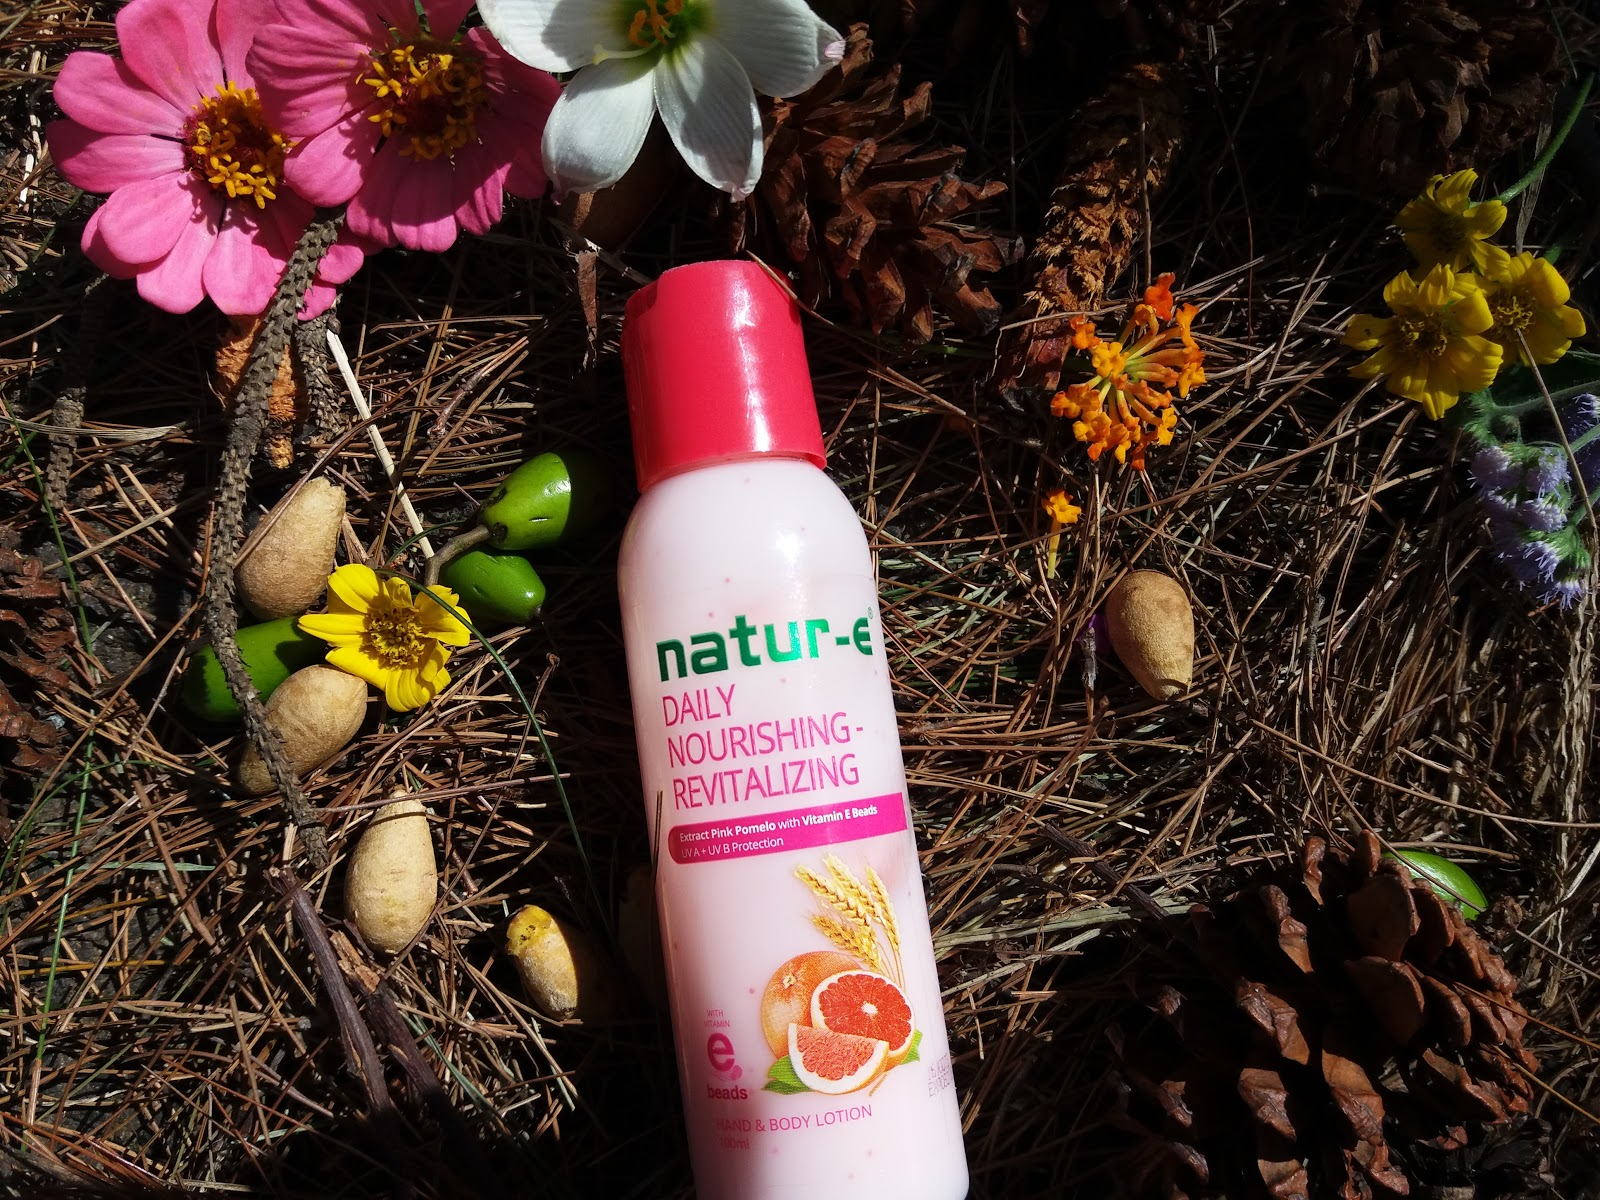 Review Natur E Daily Nourishing Revitalizing Hand Body Lotion Buy 1 Get 100 Ml I Handbody Thank You